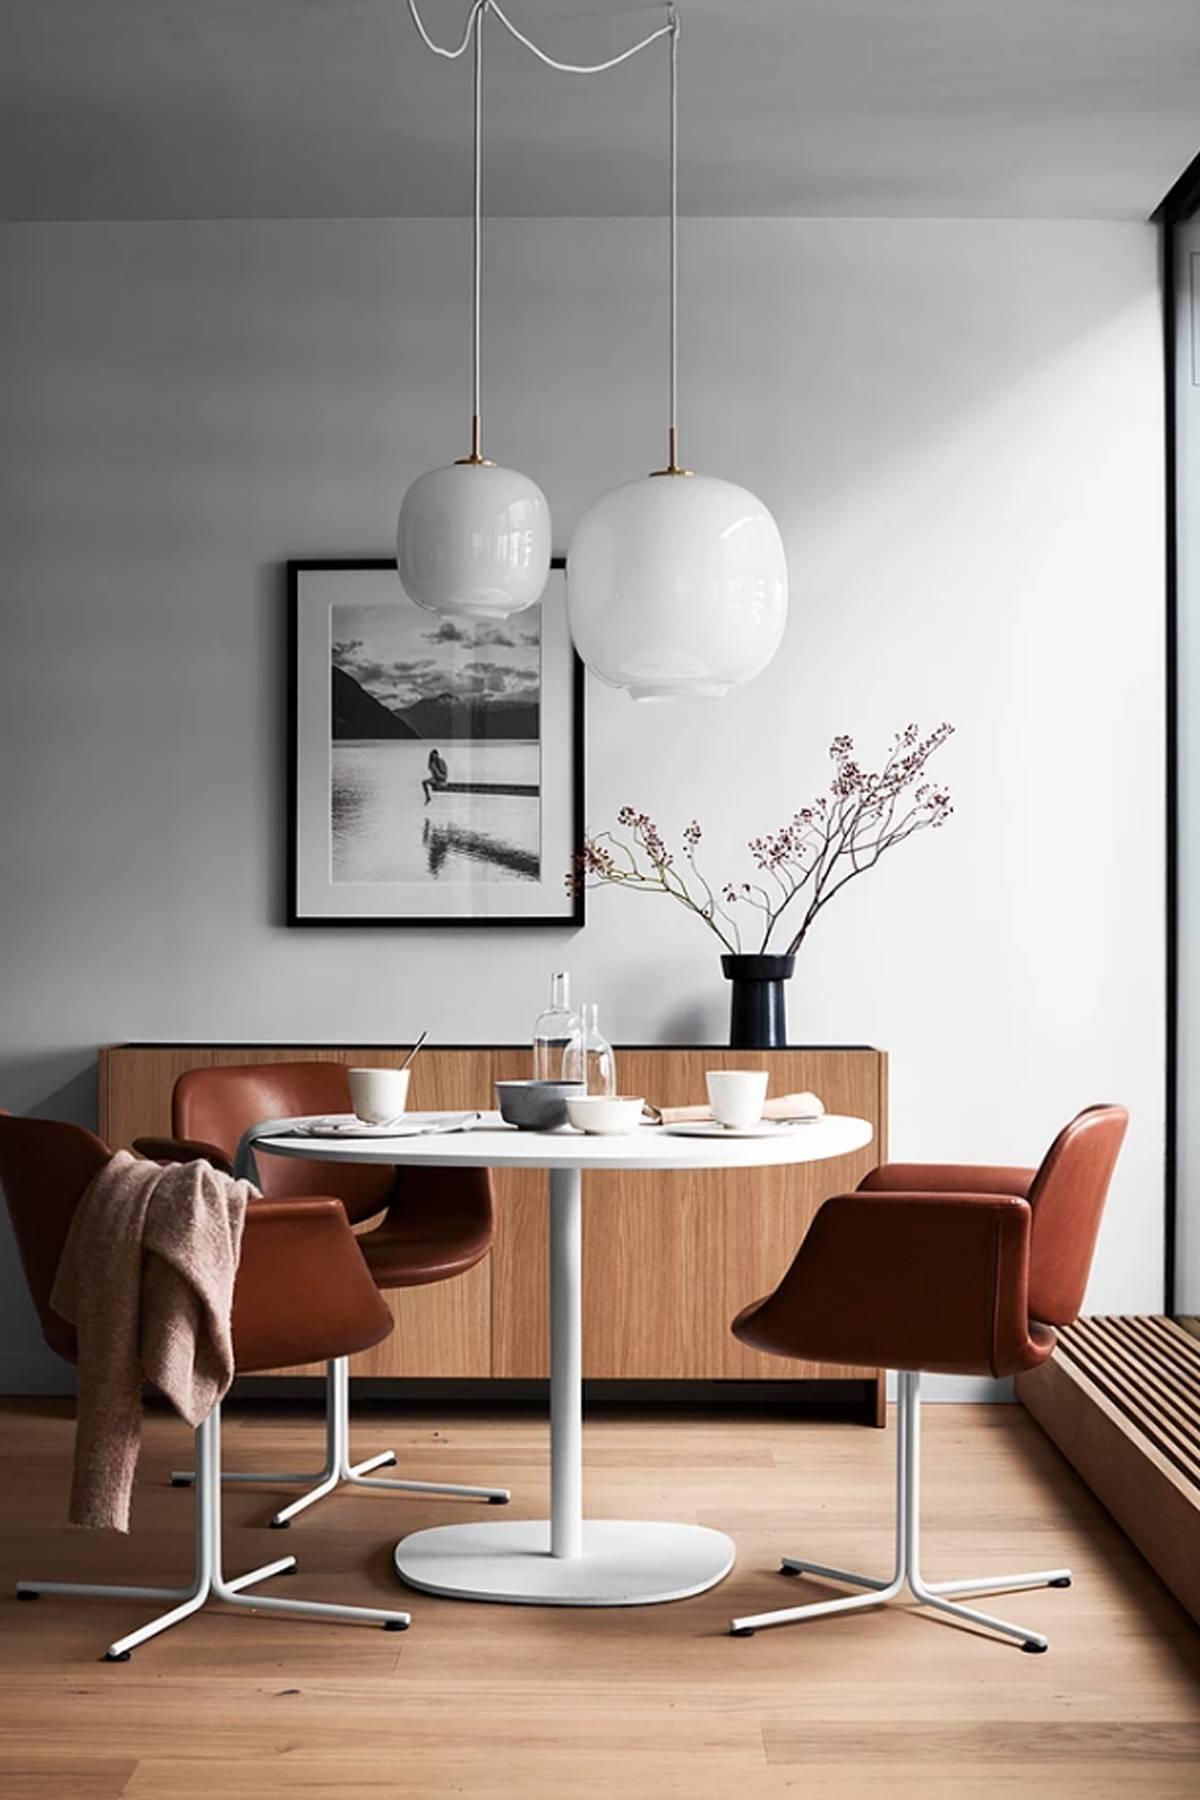 scandinavian-interior-design-ideas-252735-1521559309513-image.1200x0c